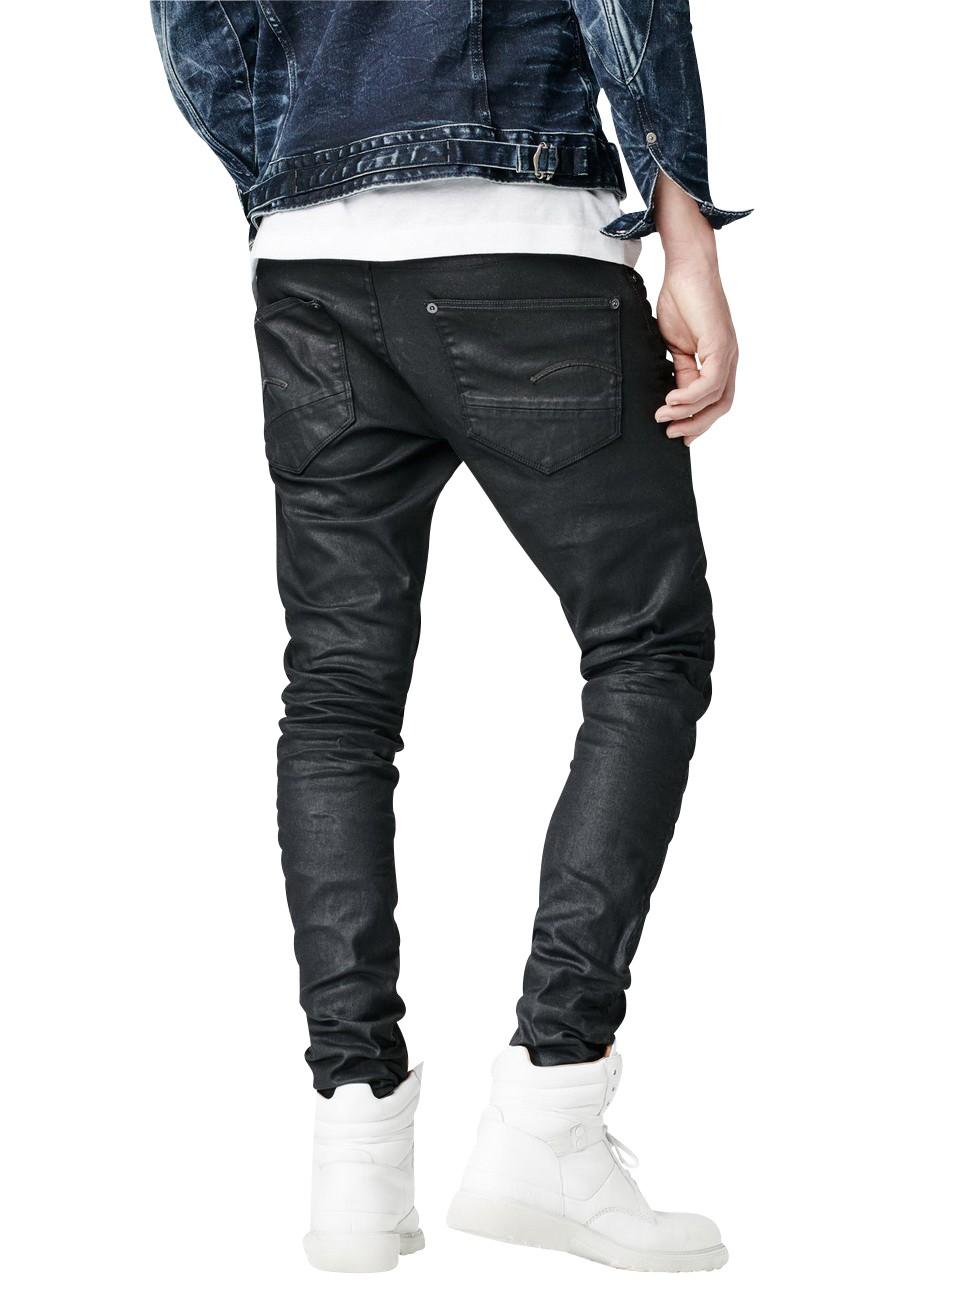 G-Star Herren Jeans Revend - Super Slim Fit - 3D Dark Aged